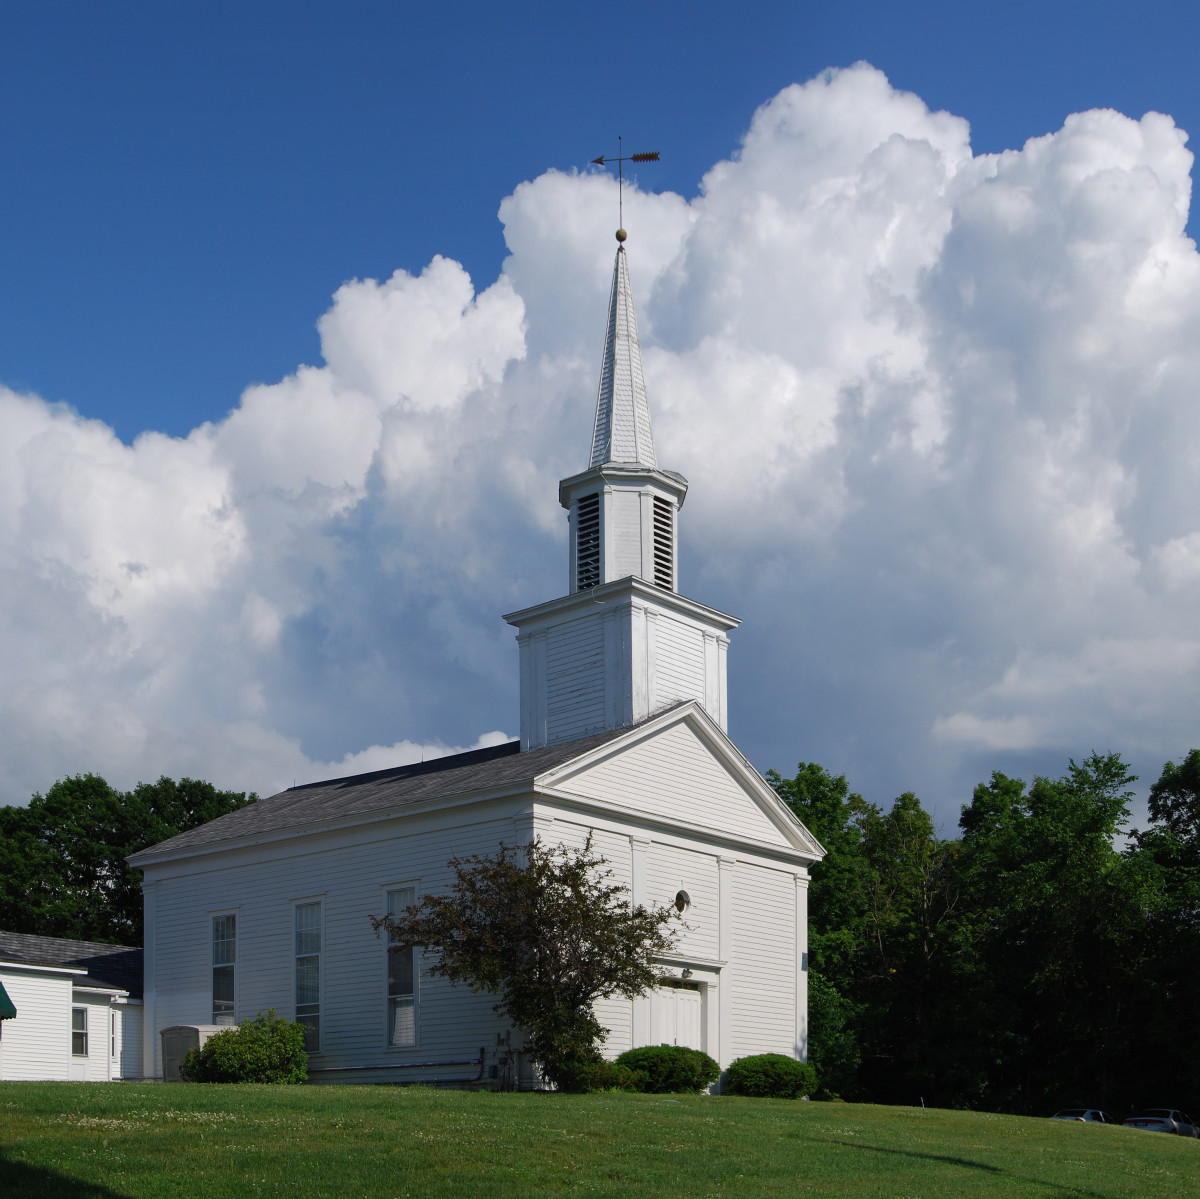 ONE OF 350,000 CHURCHES IN AMERICA